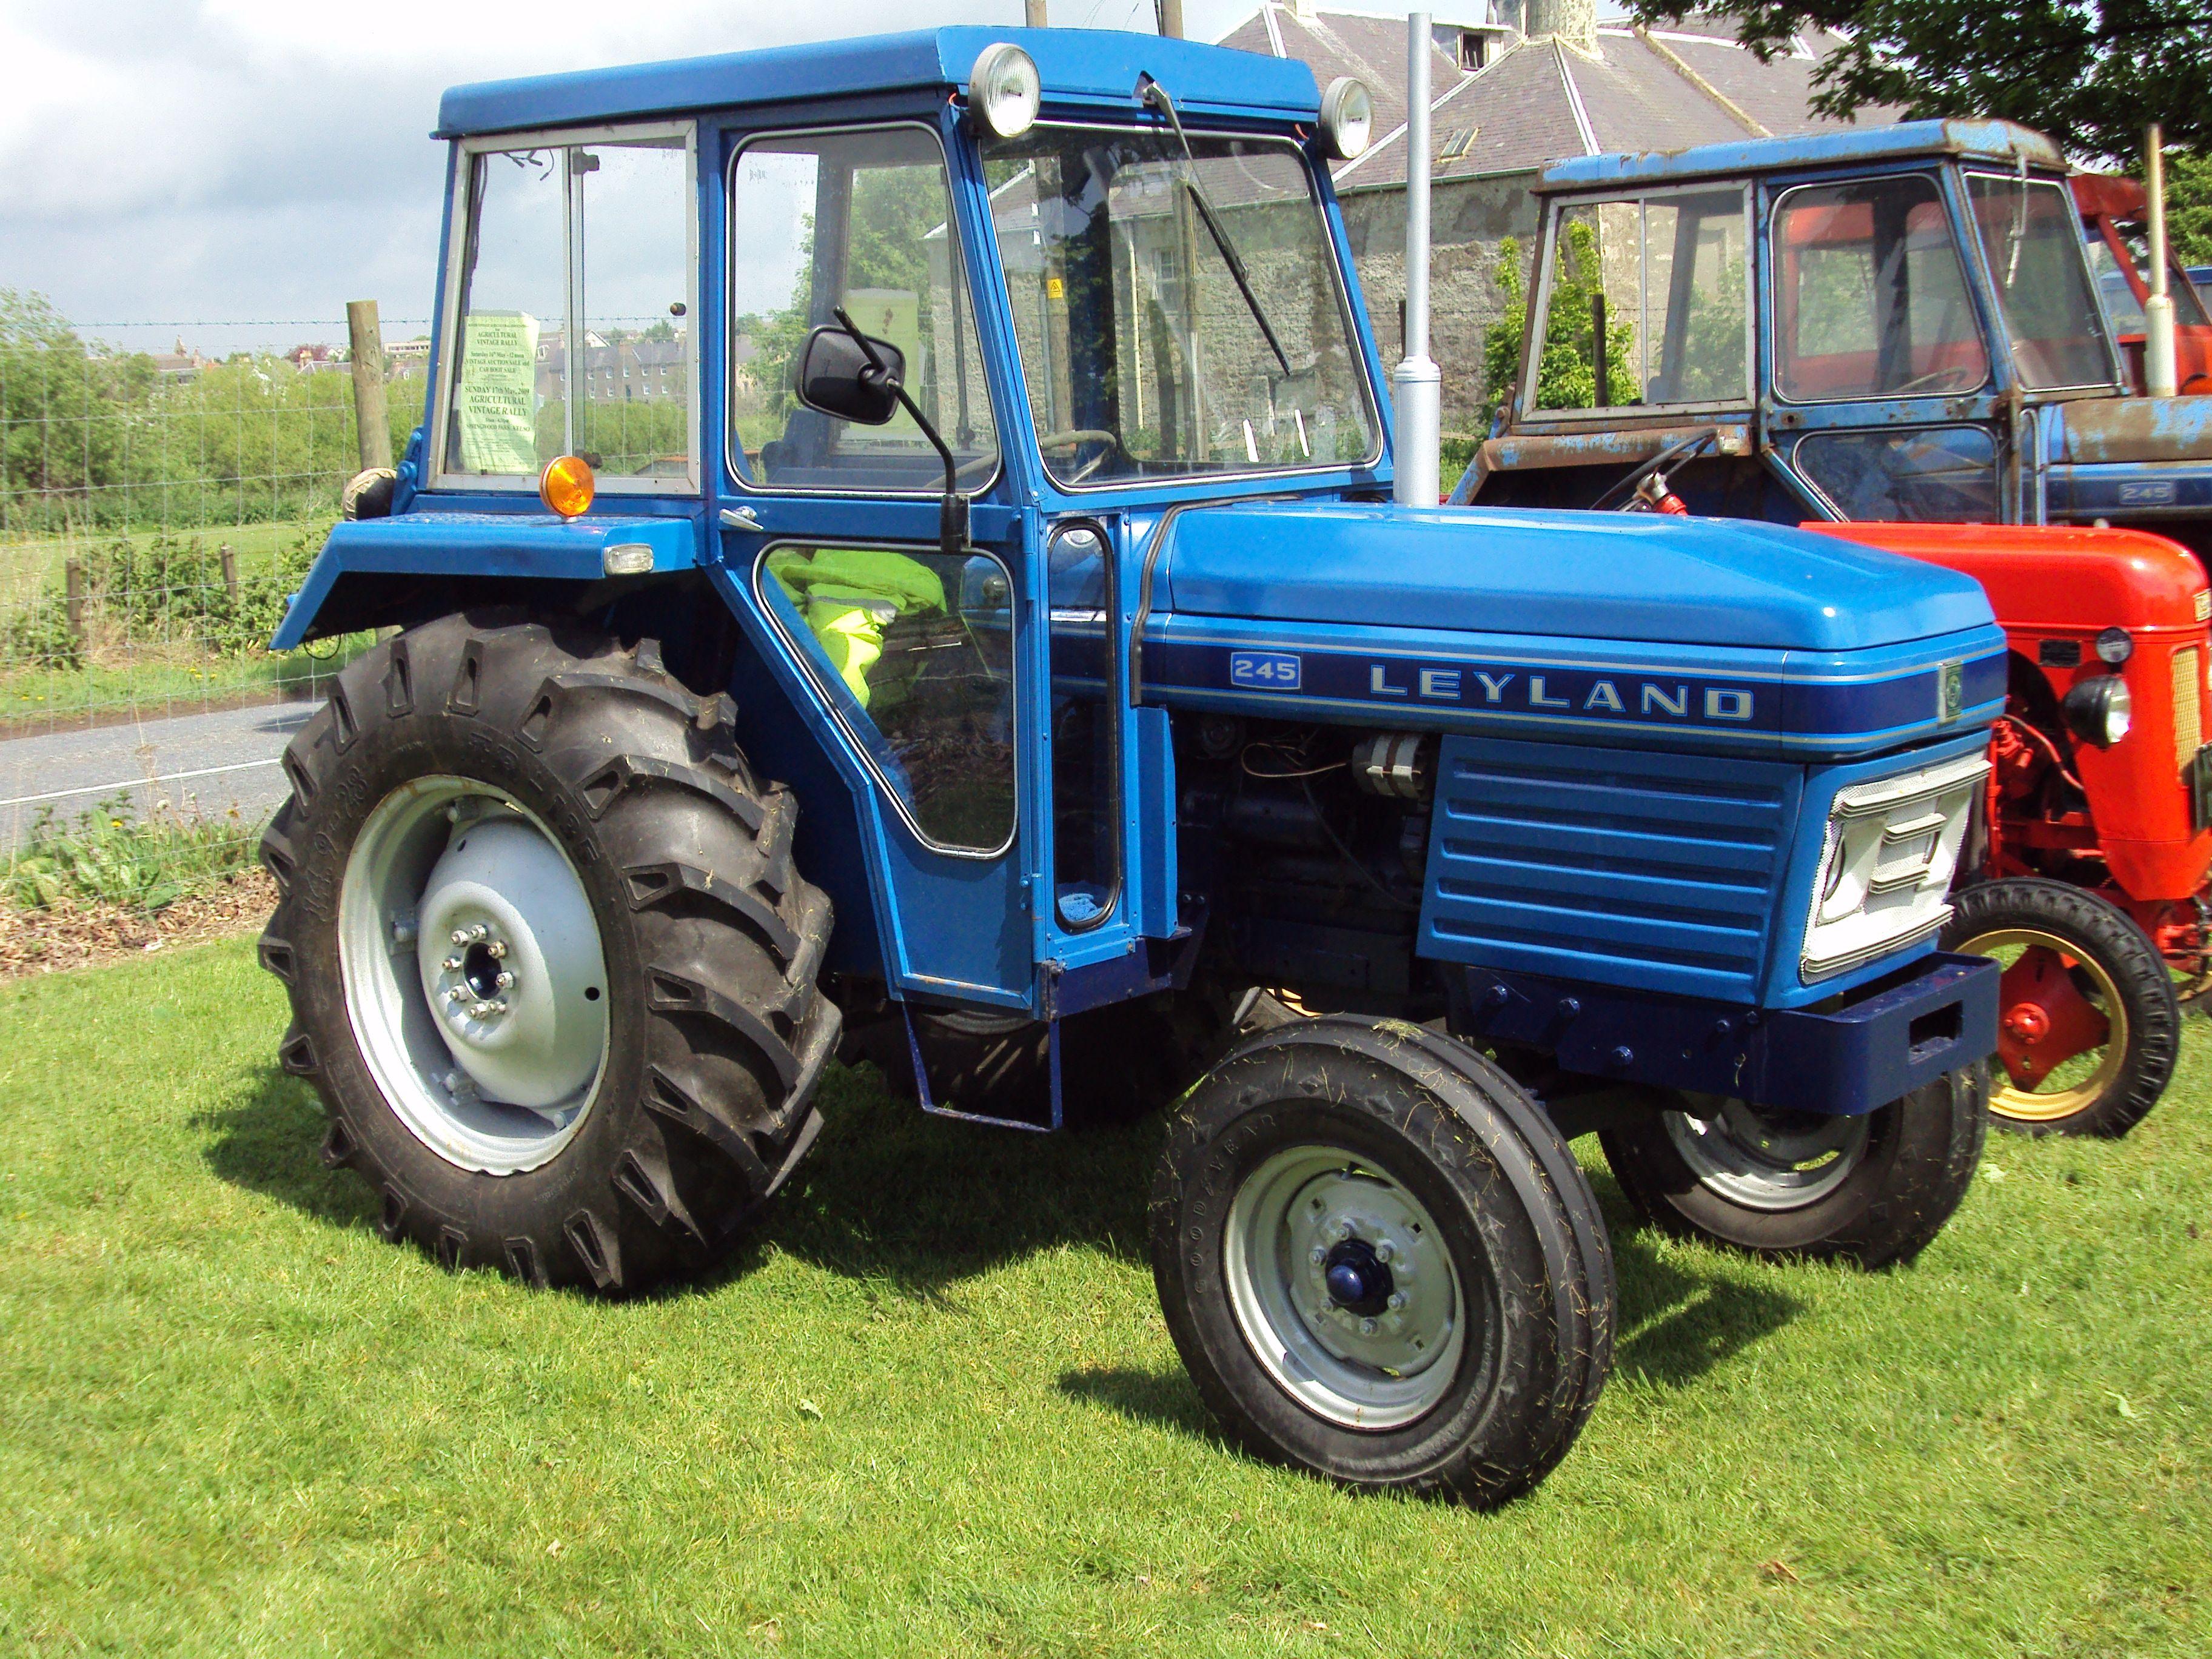 Leyland Tractor 154 Service Manual